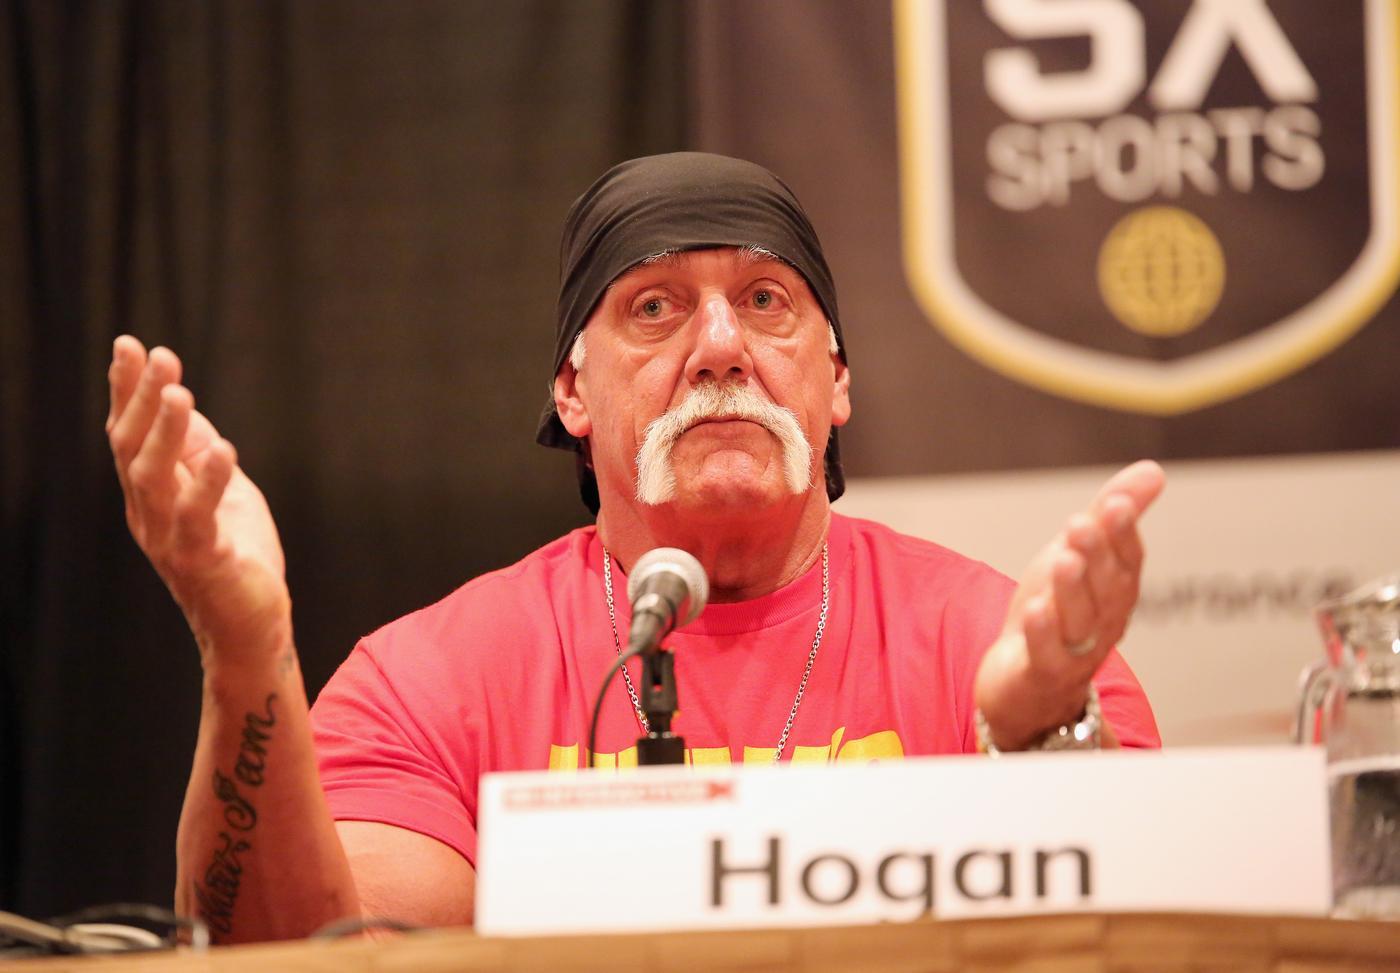 Hulk Hogan apologises for 'unacceptable' racial slurs as WWE confirms wrestler's 'sacking'